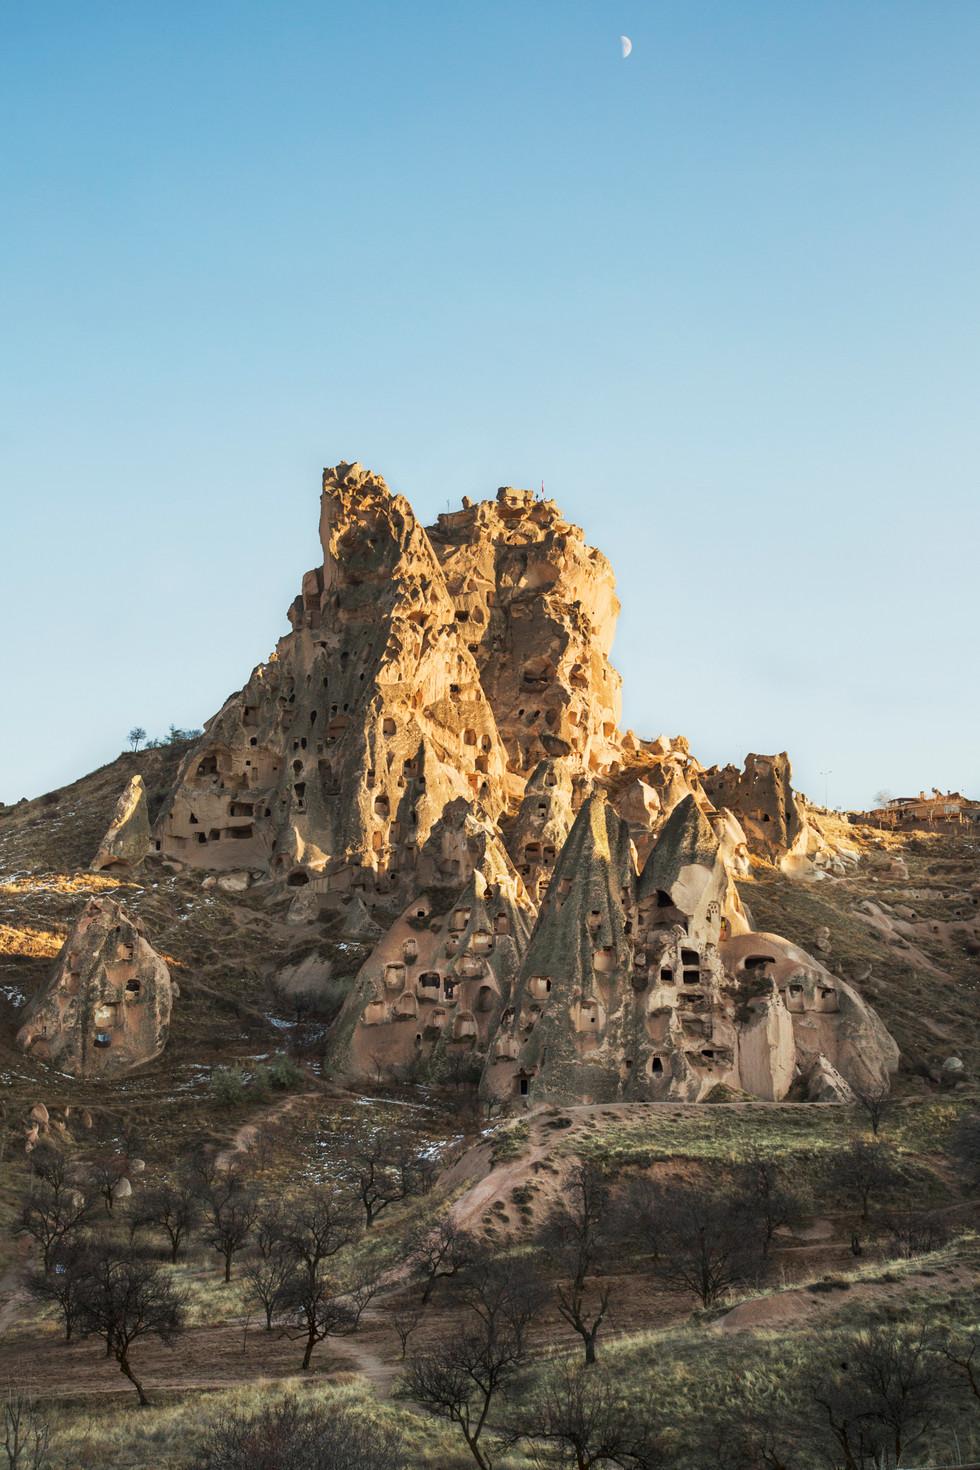 Moon and rocks, Cappadocia, Turkey, 2017